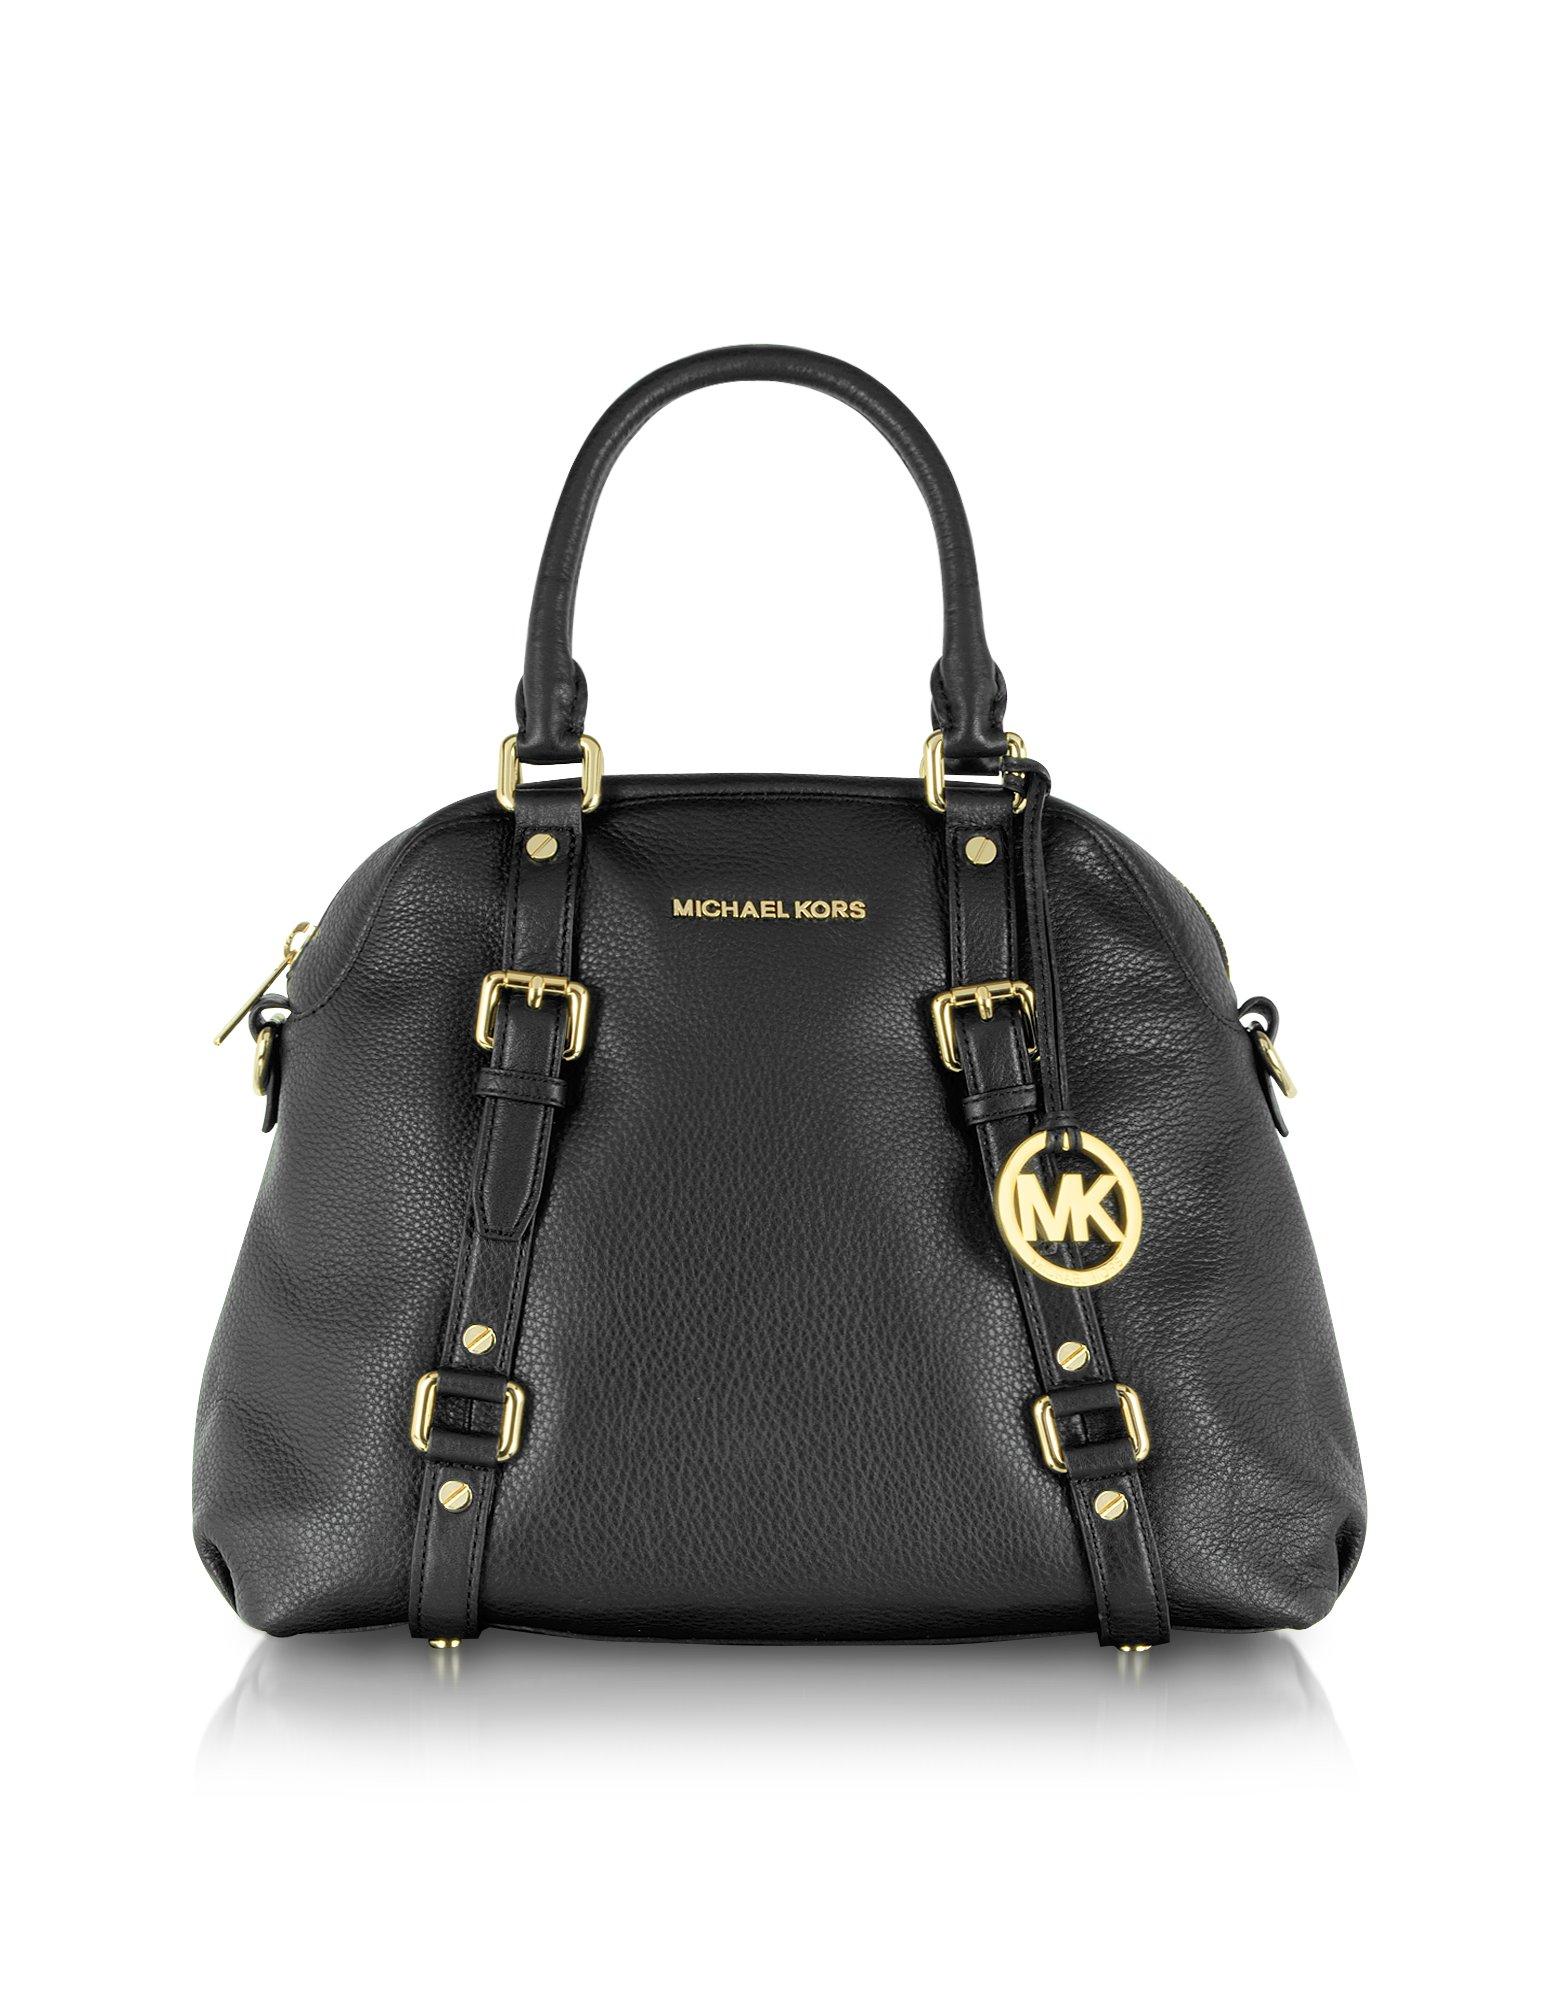 60b5fe6766df Lyst - Michael Kors Bedford Genuine Leather Bowling Satchel Bag in Black